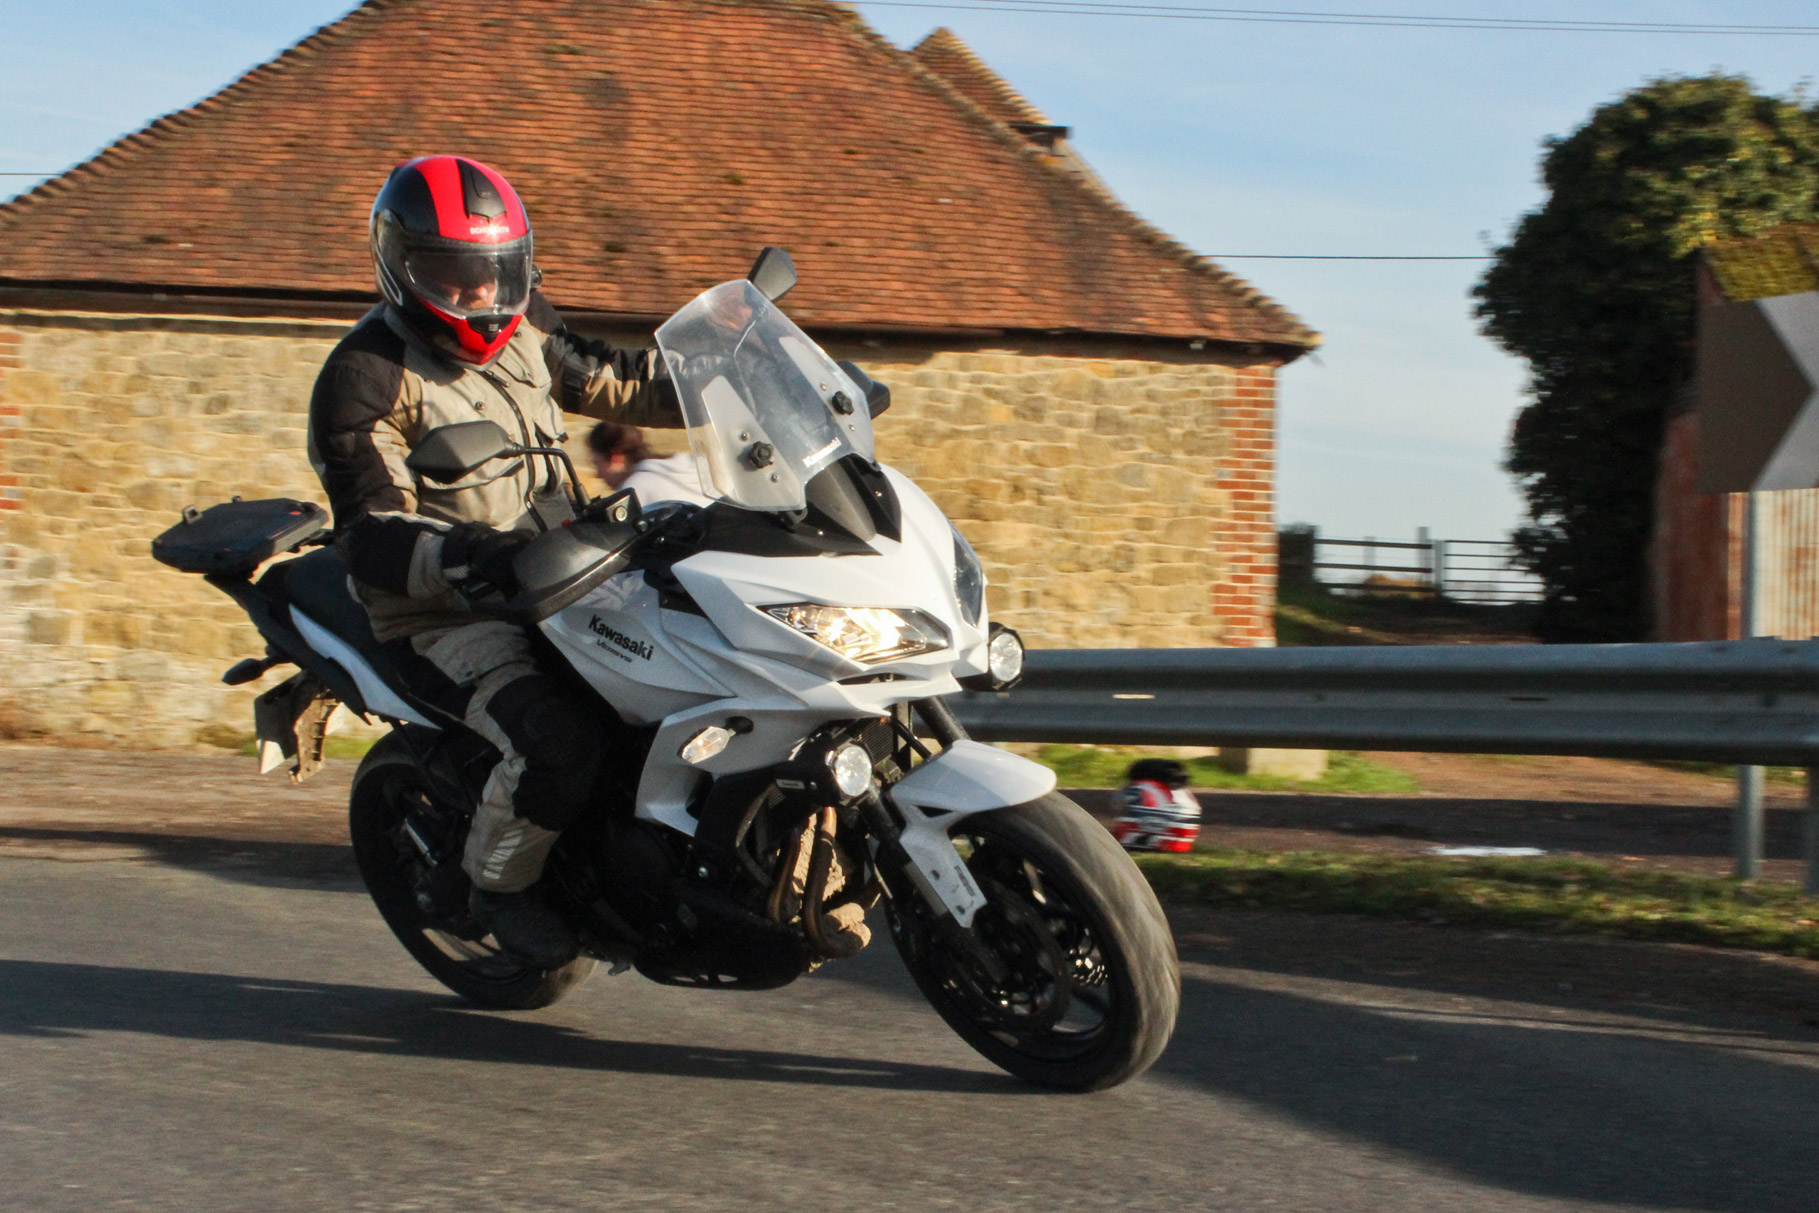 Back To Back Test Yamaha Tracer 700 Vs Kawasaki Versys Visordown